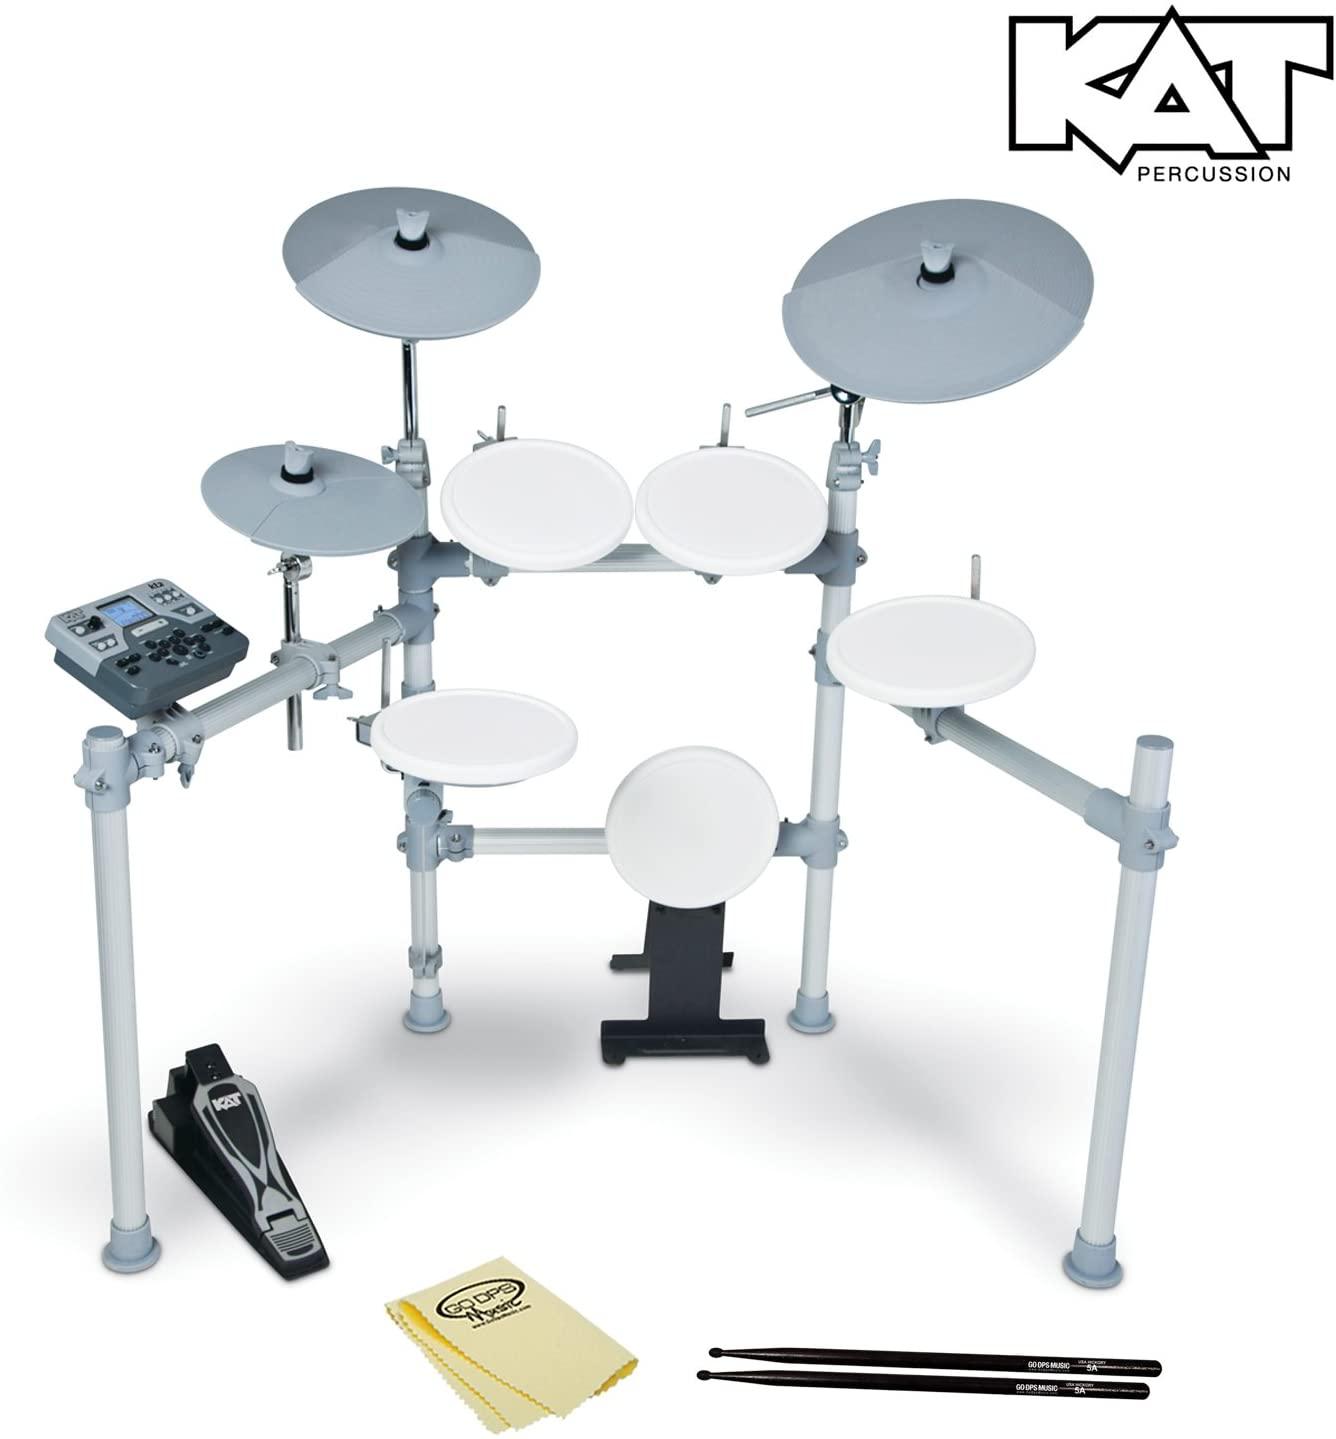 KAT Percussion High Performance KT2 Digital Drum Set - Electronic Drum Set Includes GoDpsMusic Polish Cloth & Vic Firth/GoDpsMusic 5a Drumsticks